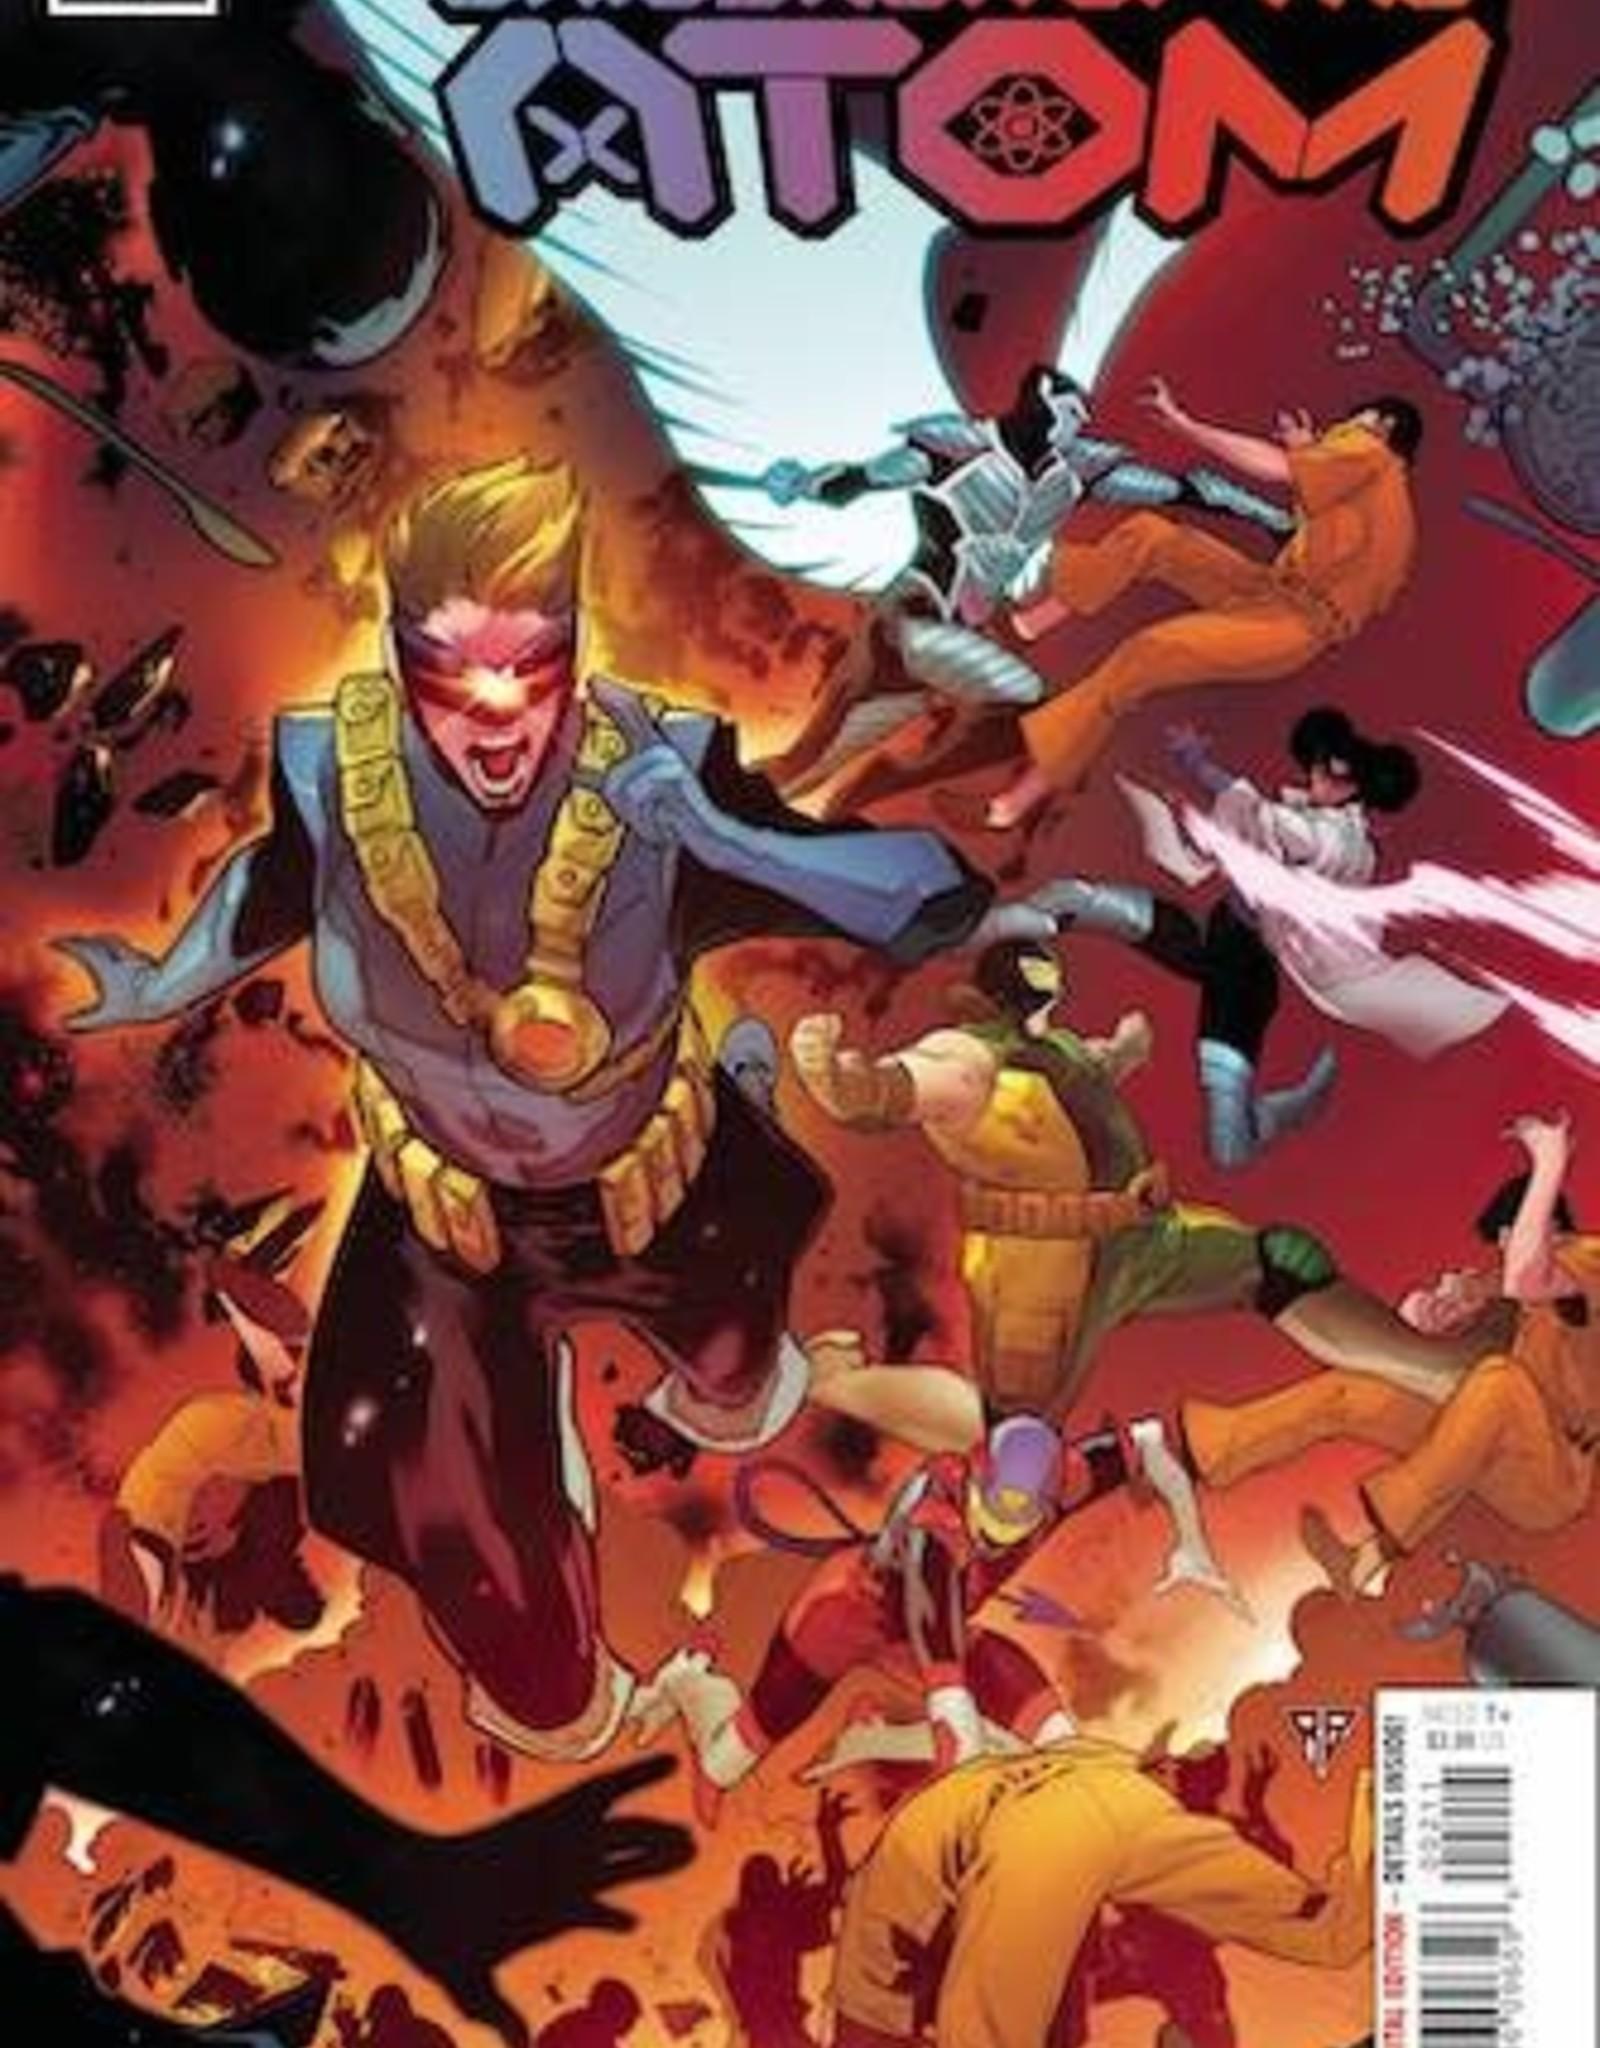 Marvel Comics Children Of Atom #2